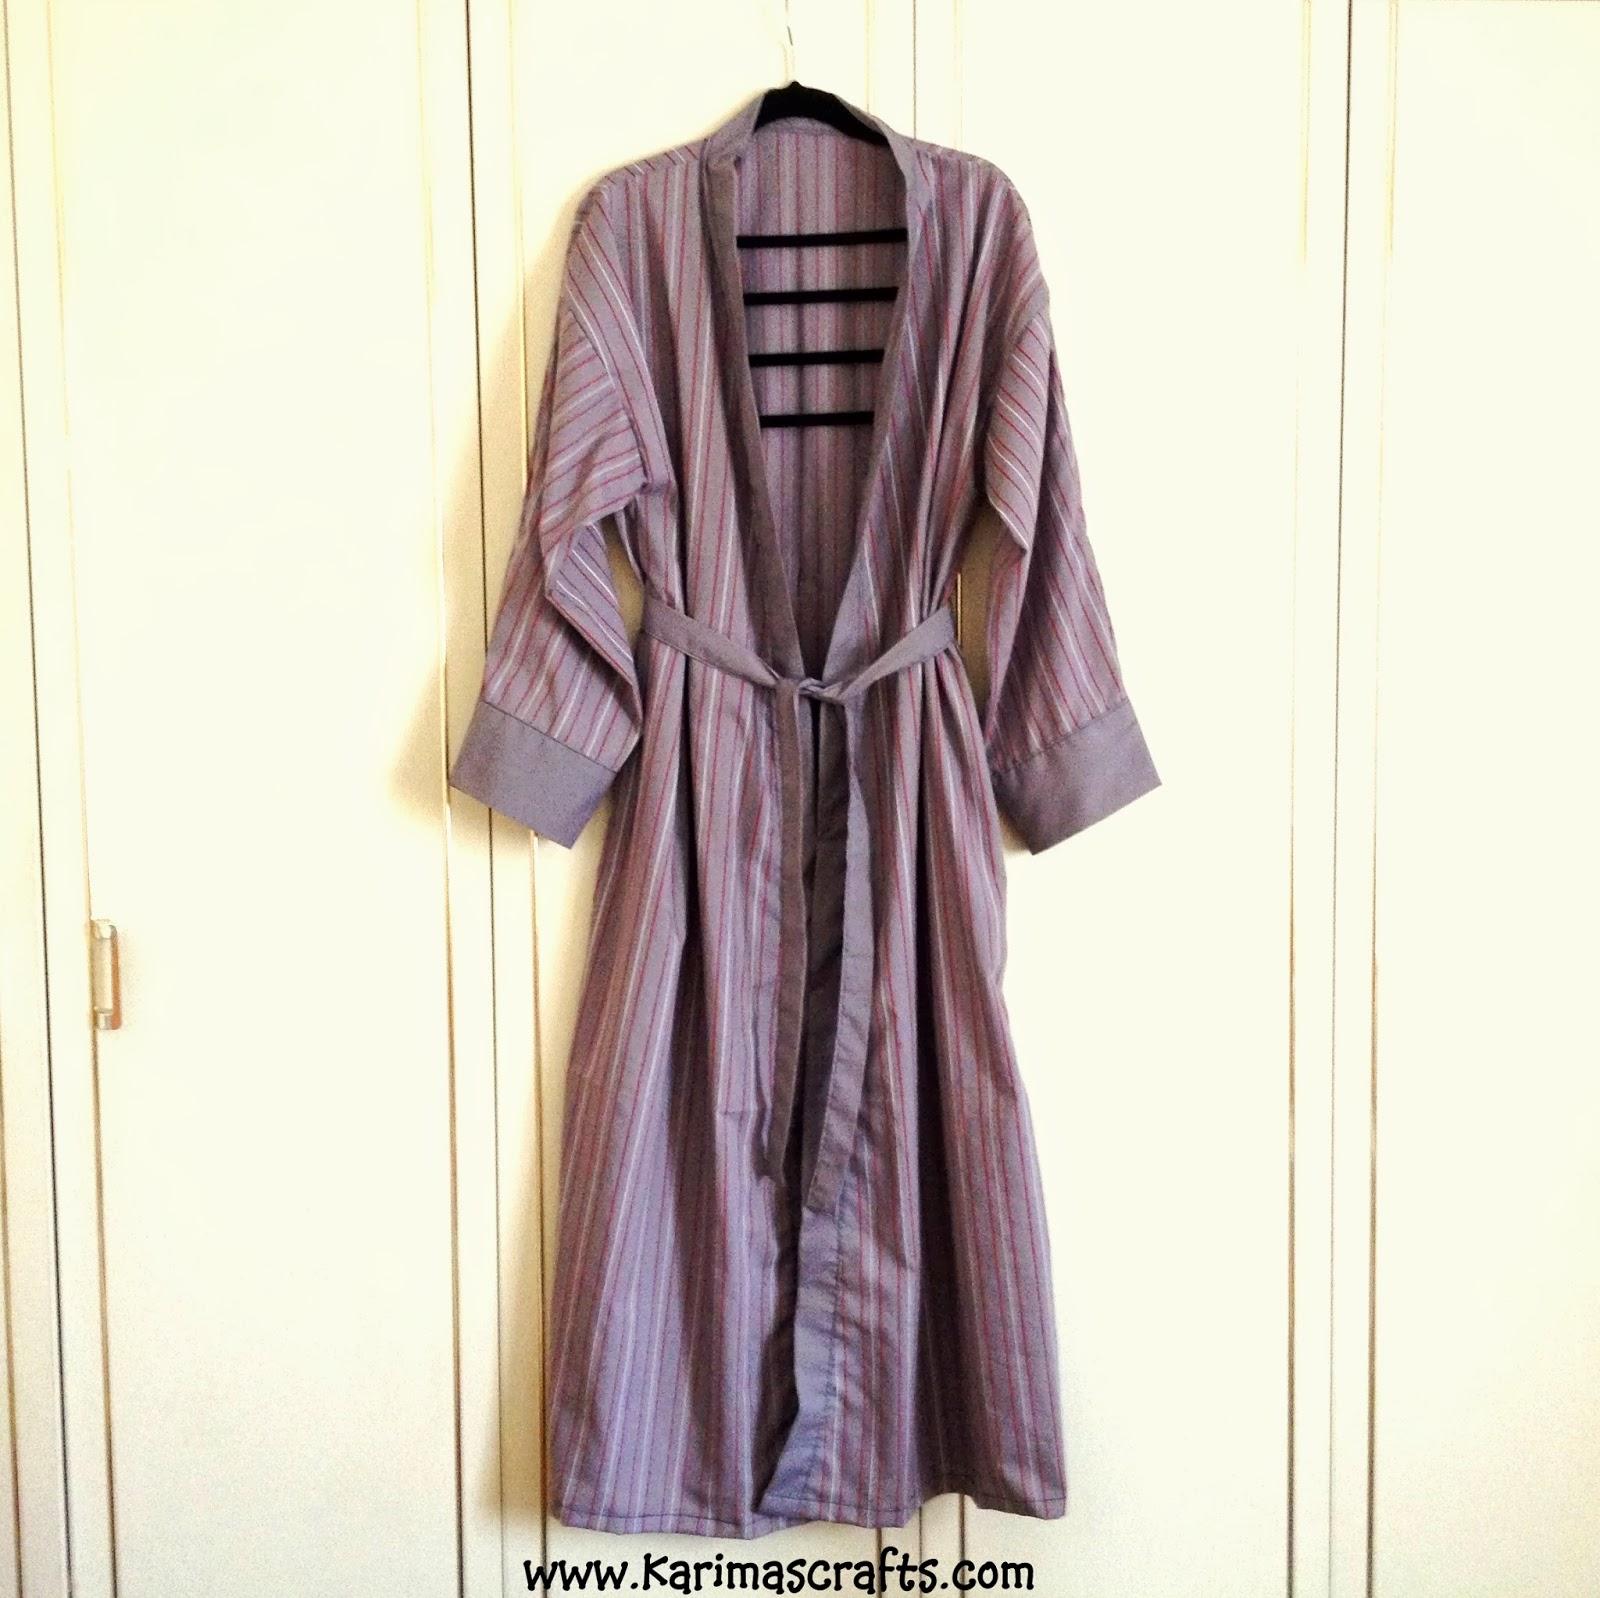 Karima\'s Crafts: Bathrobe / Dressing Gown Mini Tutorial